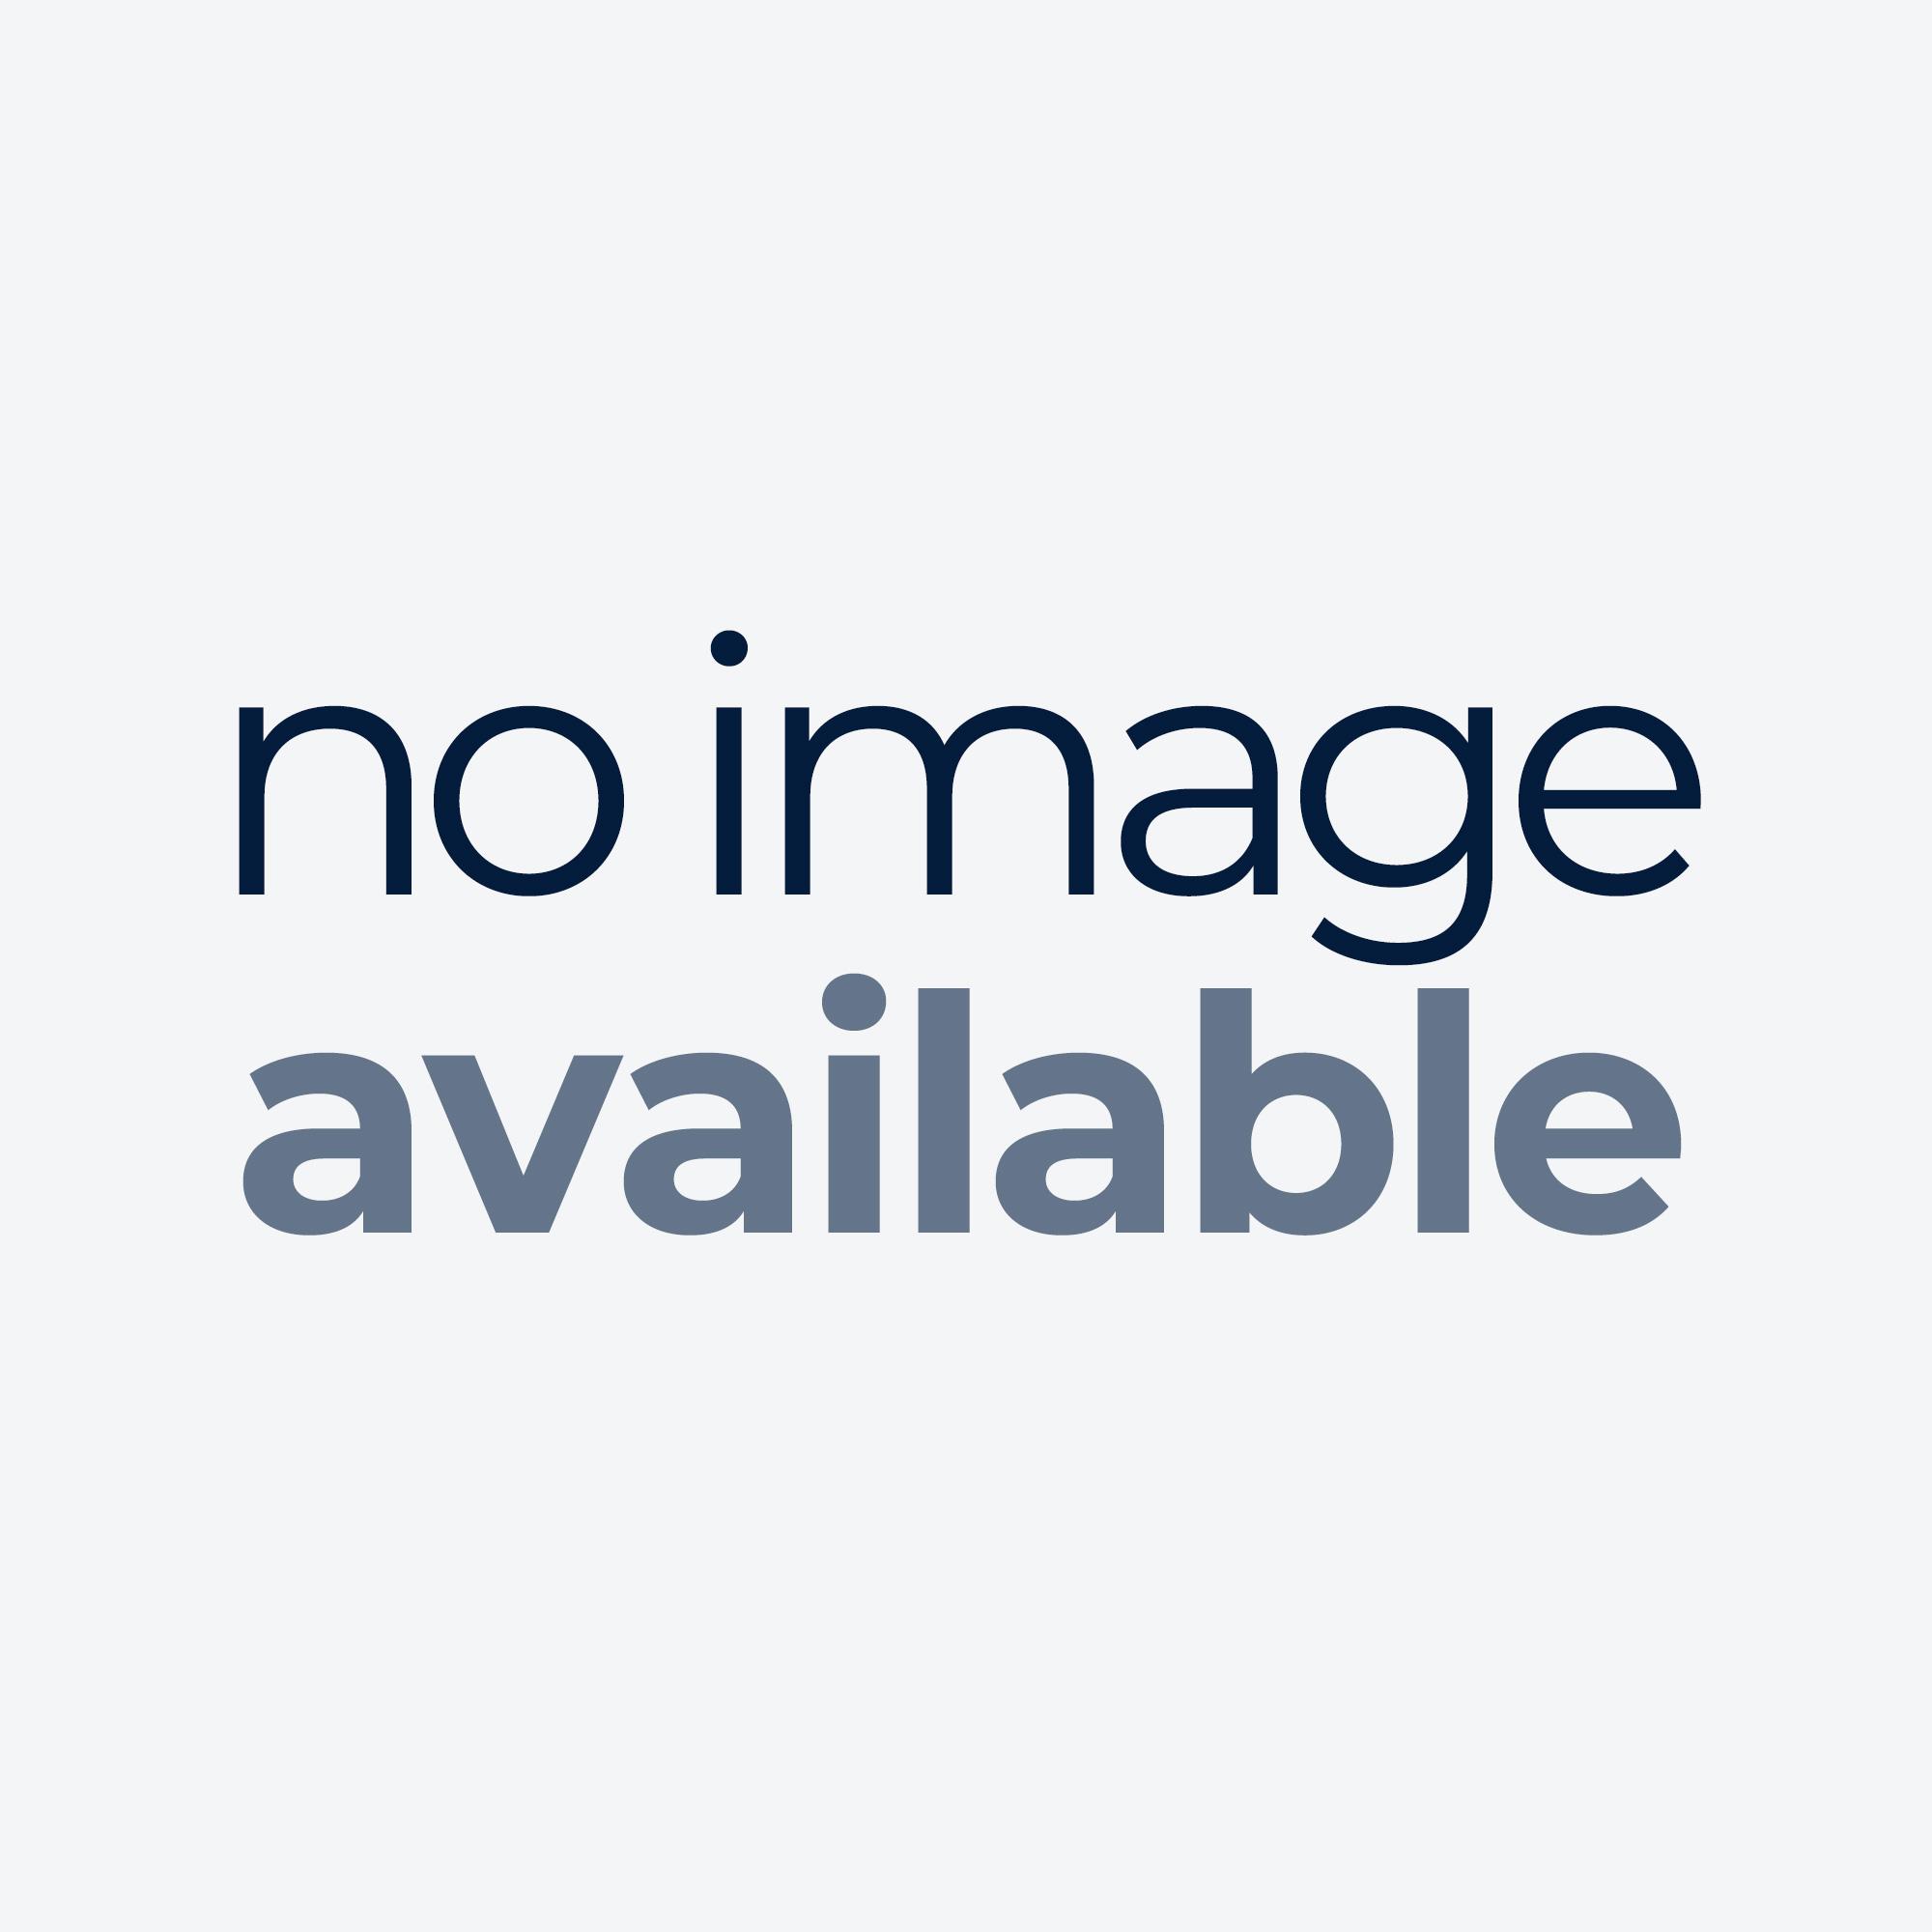 https://www.castlegatelights.co.uk/images/astro-lighting-blanco-round-single-trimless-recessed-spot-light-fitting-in-white-finish-p34779-36612_image.jpg